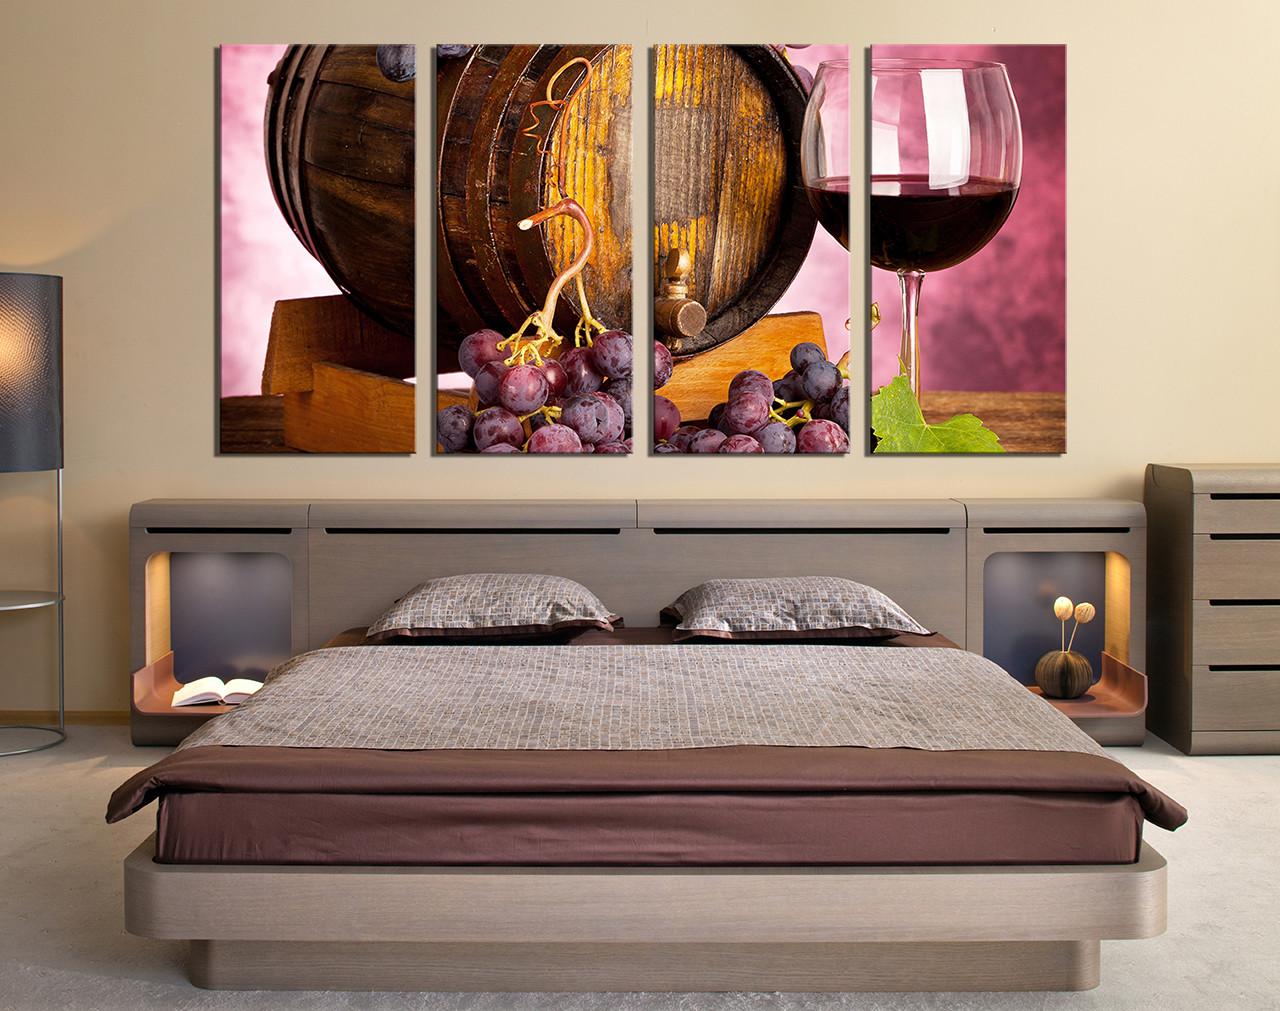 4 piece canvas wall art bedroom wall decor kitchen multi panel art wine